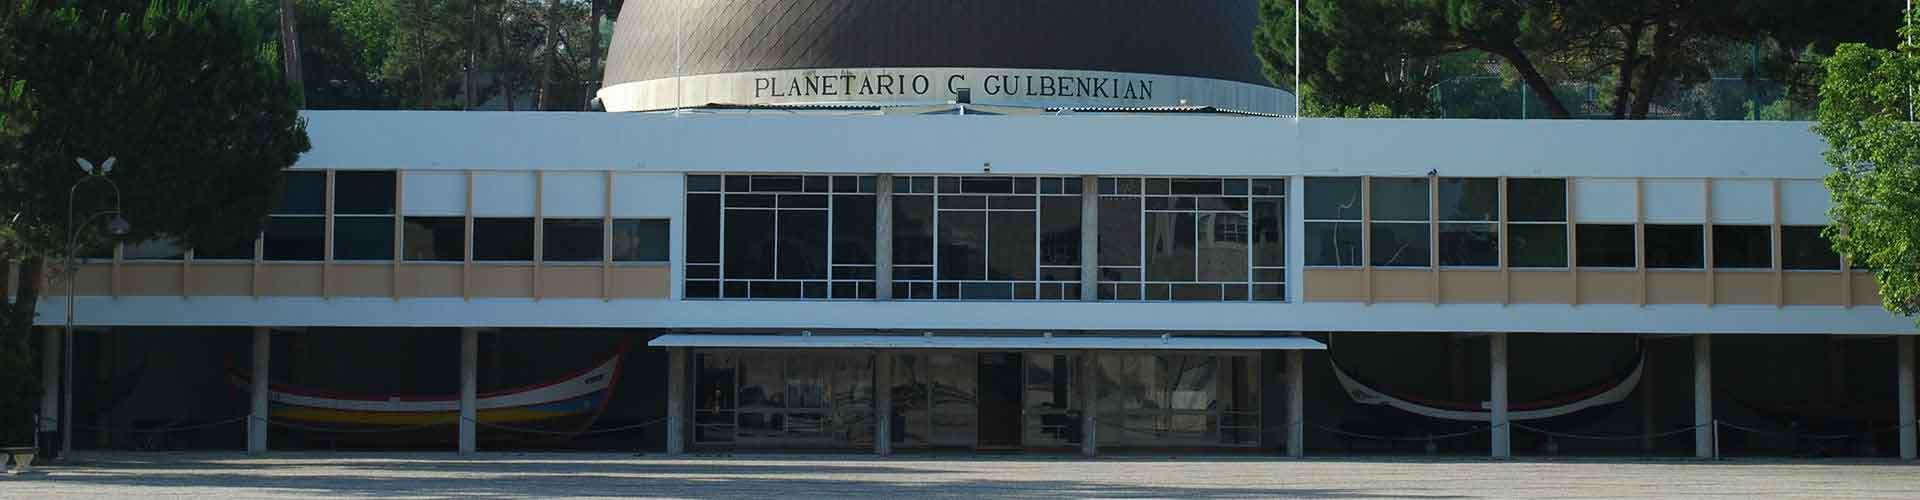 Lisboa - Habitaciones cerca a Museo Calouste Gulbenkian. Mapas de Lisboa, Fotos y comentarios de cada Habitación en Lisboa.